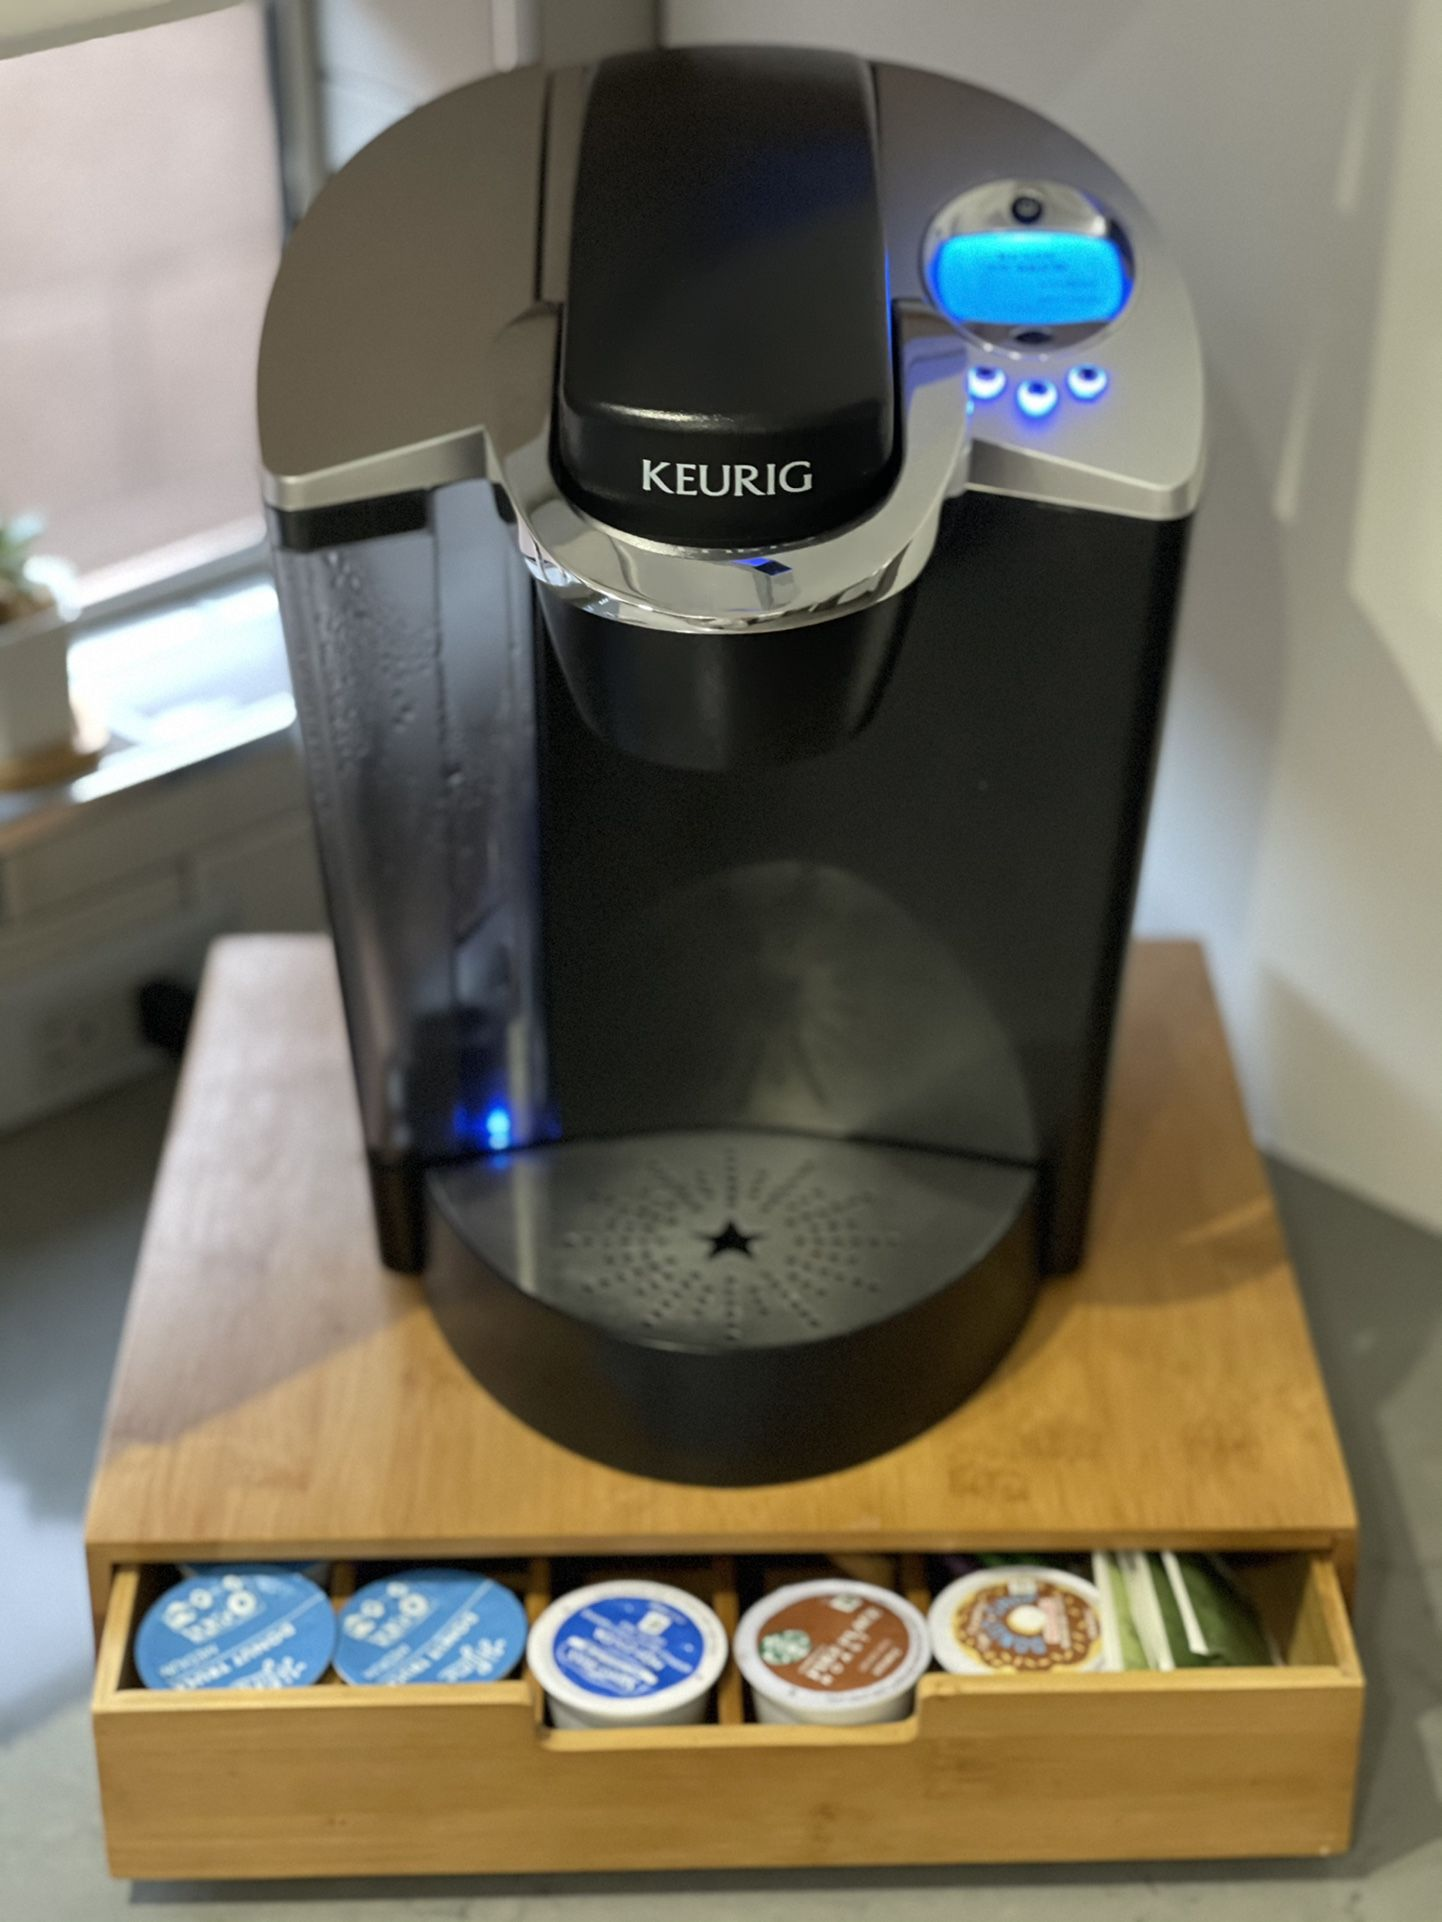 Keurig Special Edition Coffee Maker w/Storage